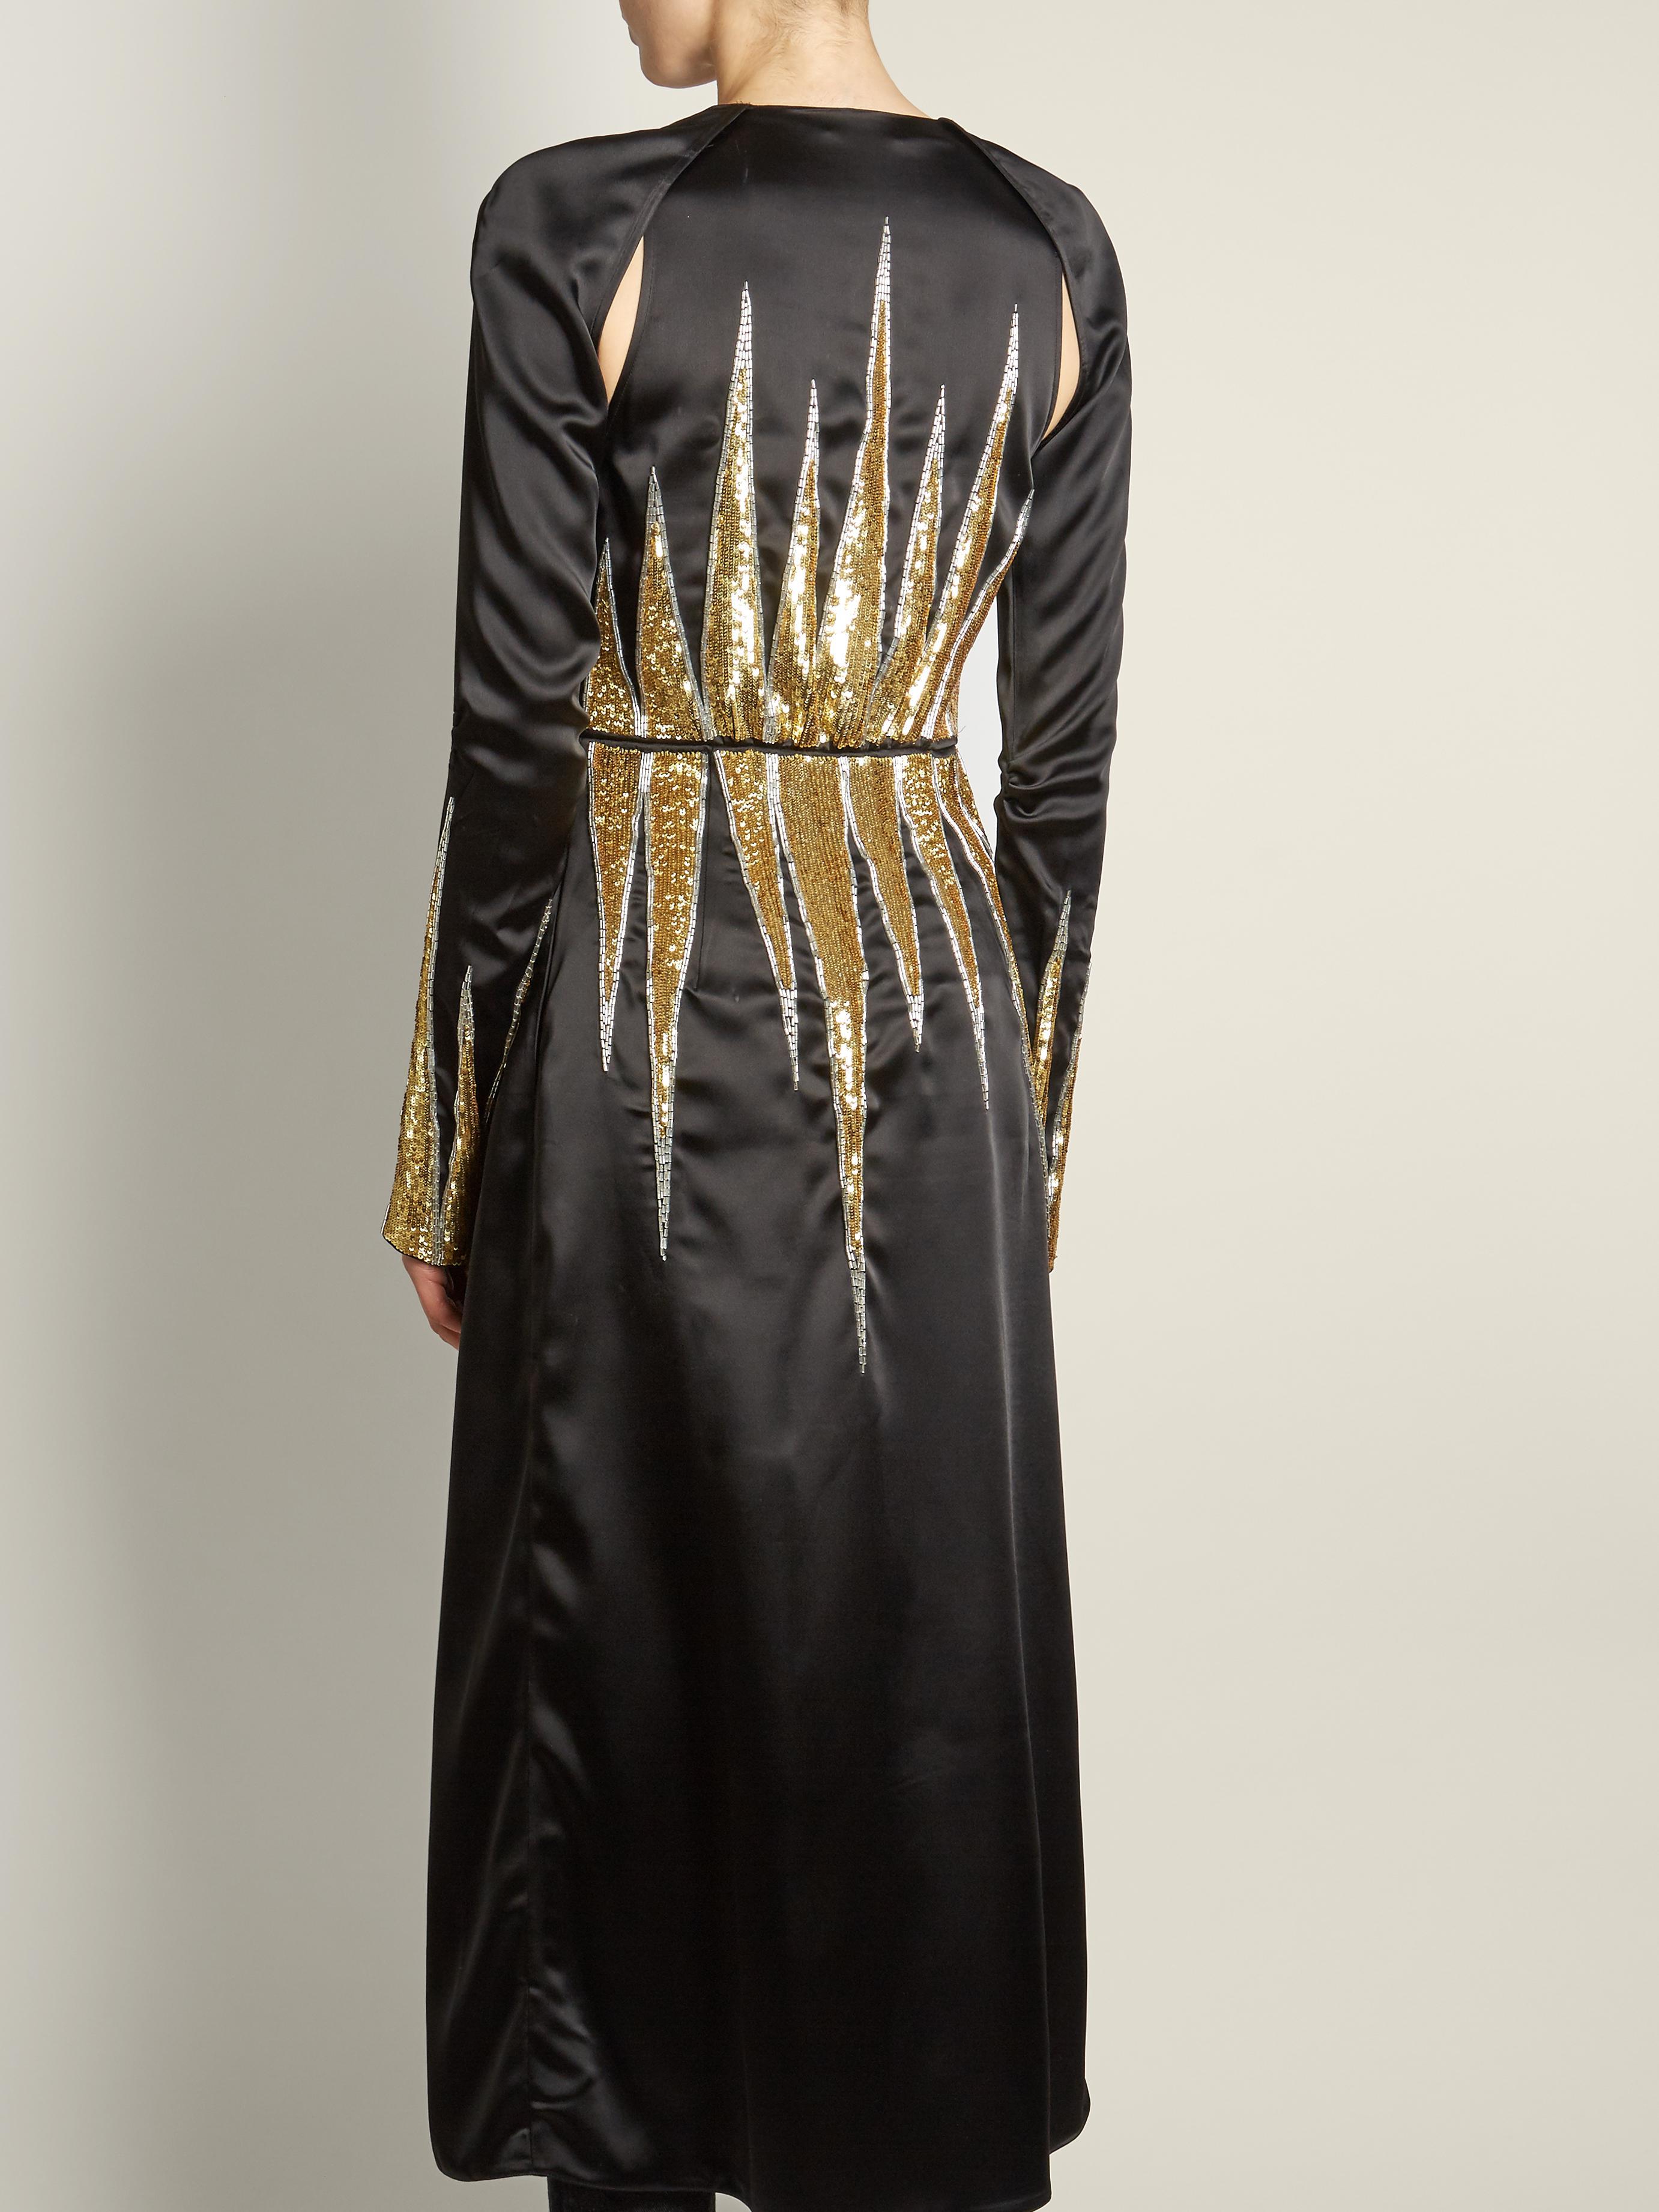 Lyst Attico Suzanne Sequin Embellished Satin Dress In Black